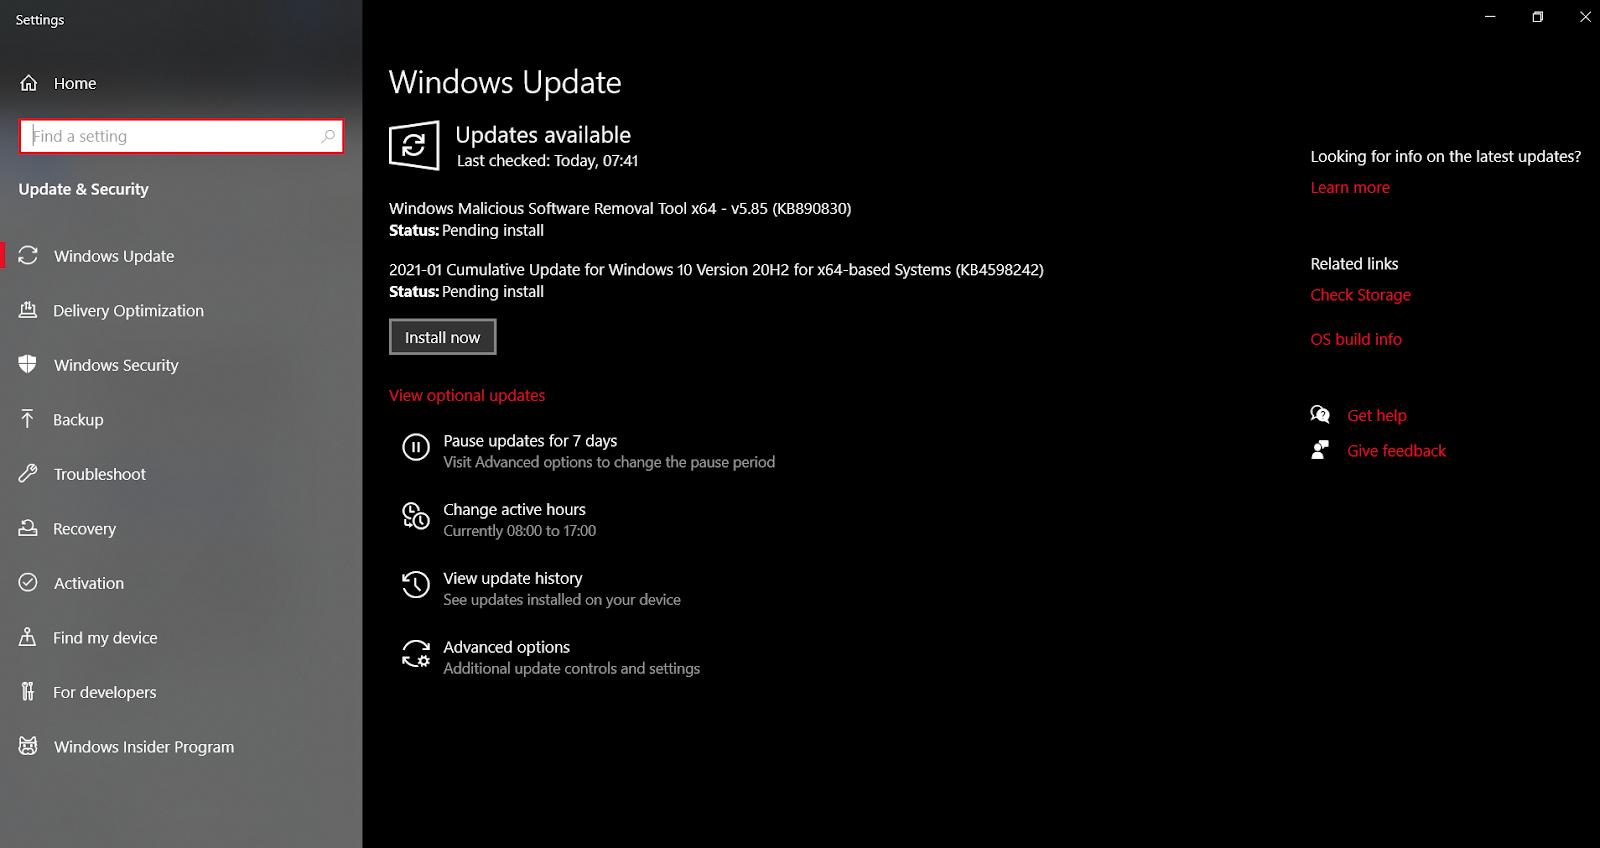 fix video stuttering on windows 10